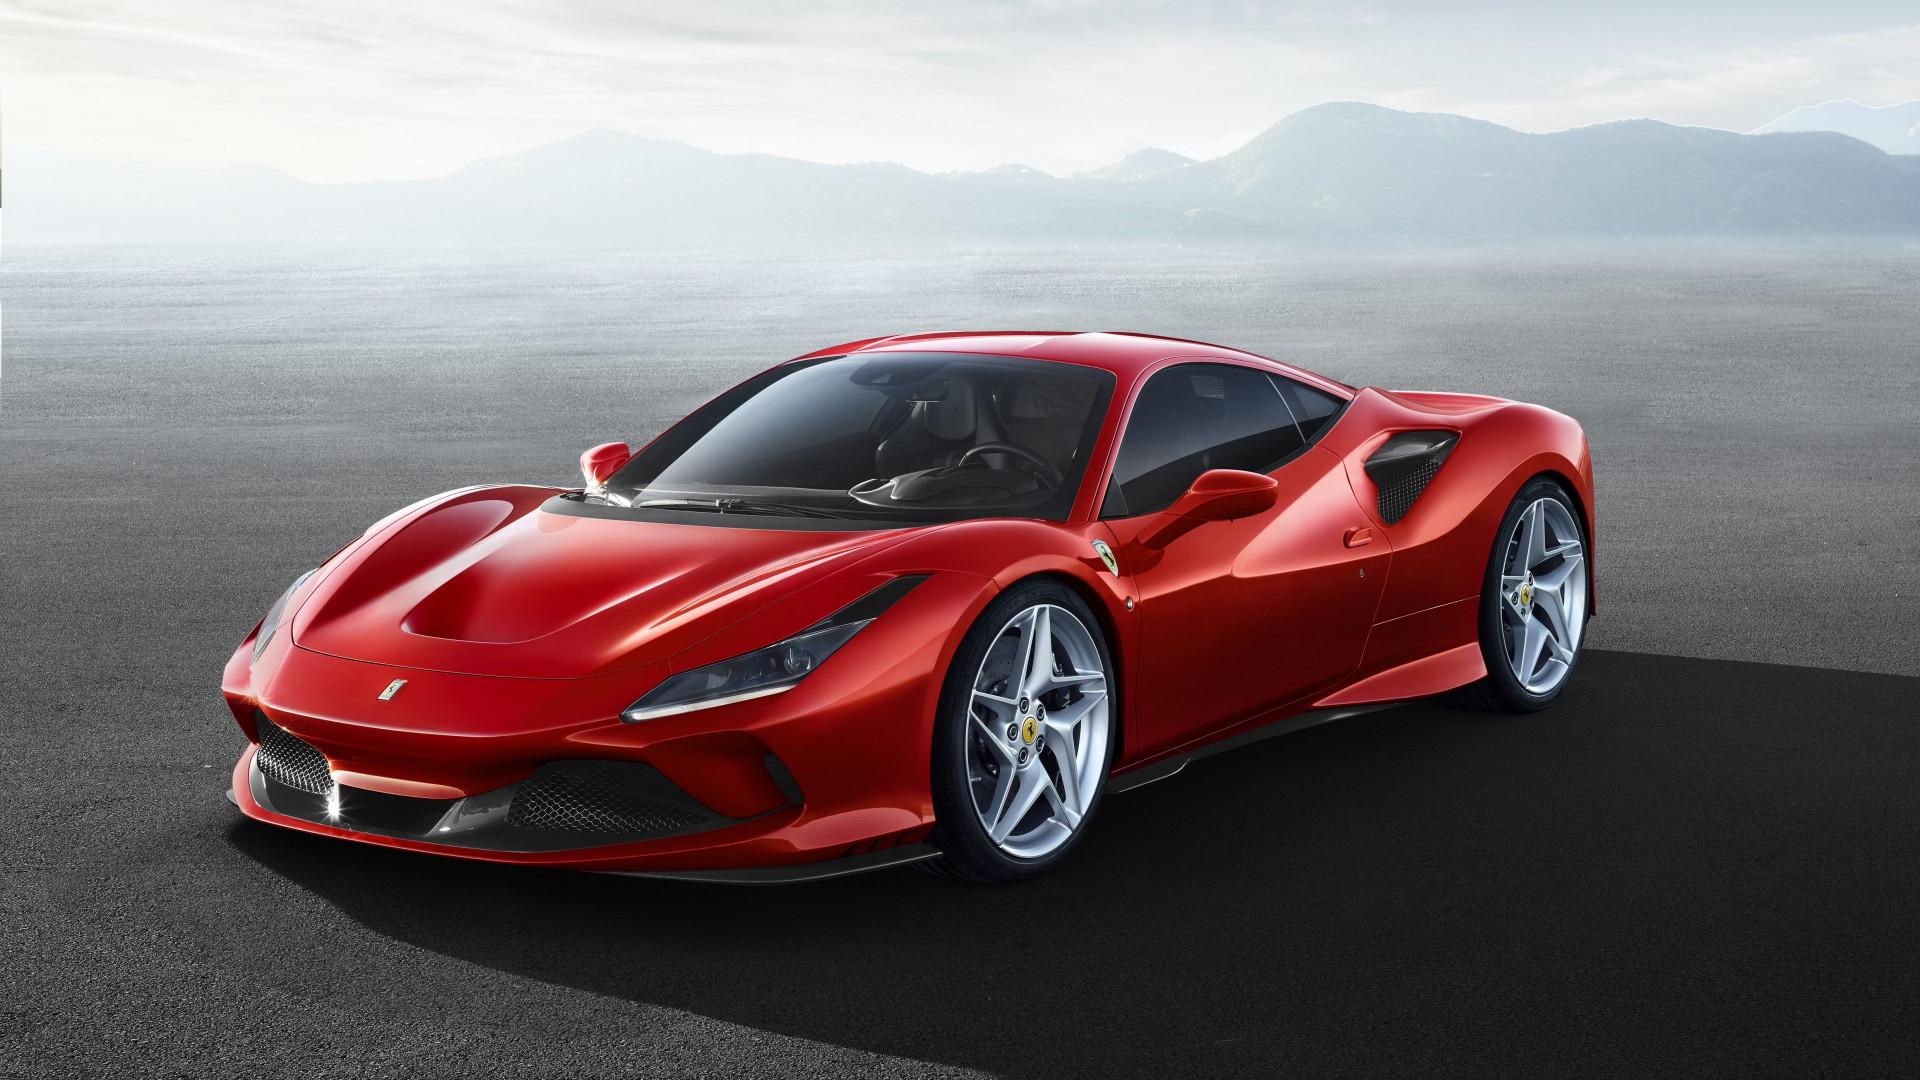 Download wallpaper: Ferrari F8 Tributo 1920x1080